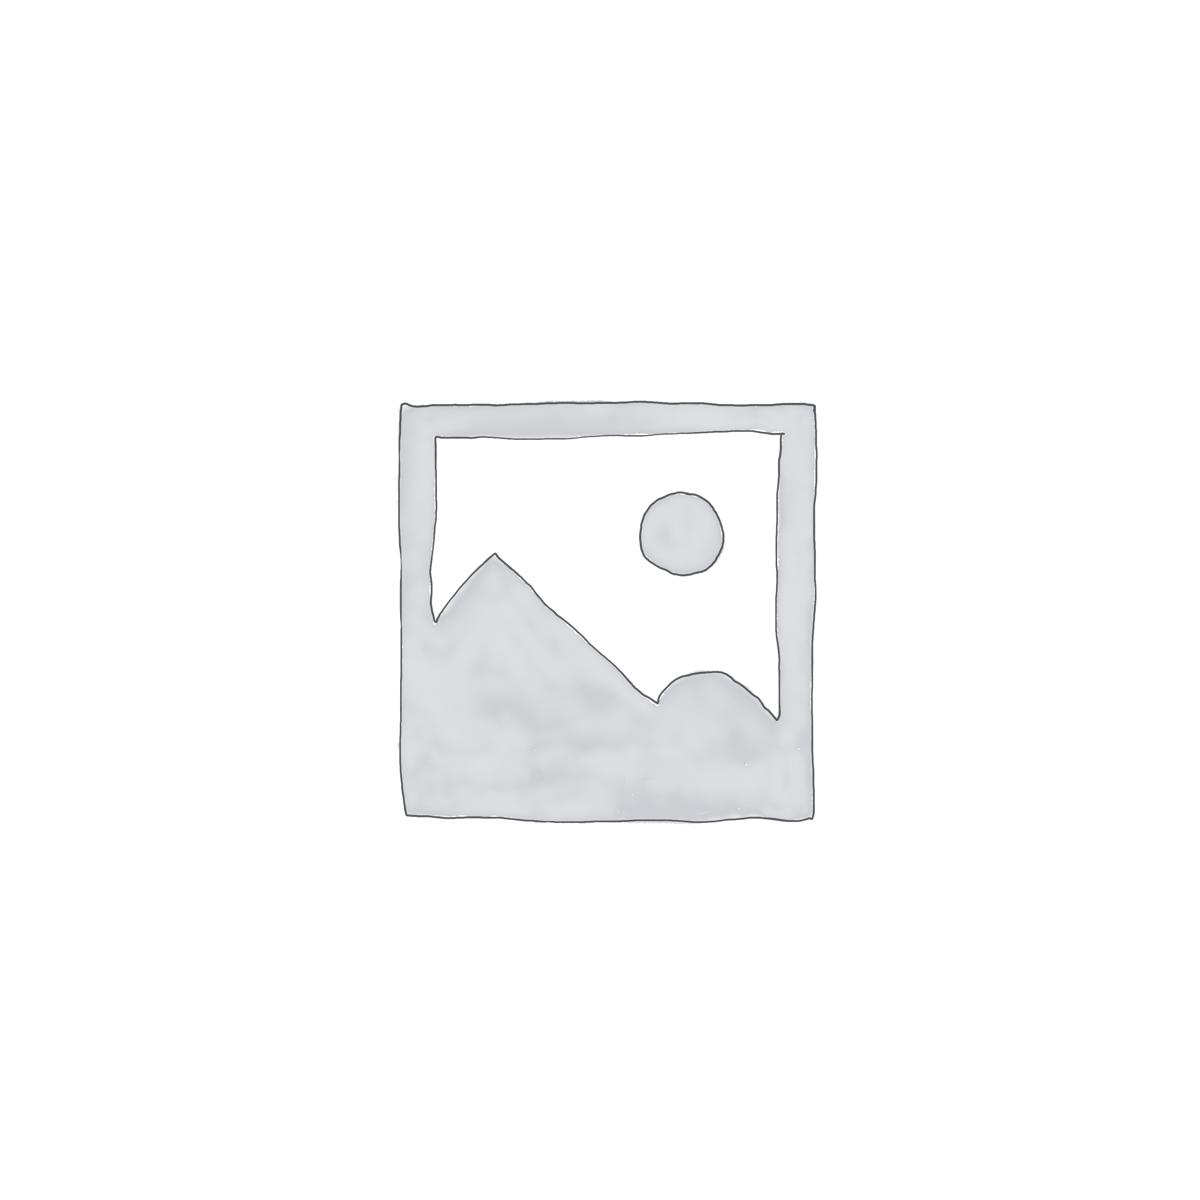 Tropical Banana Leaf with a Bird Wallpaper Mural